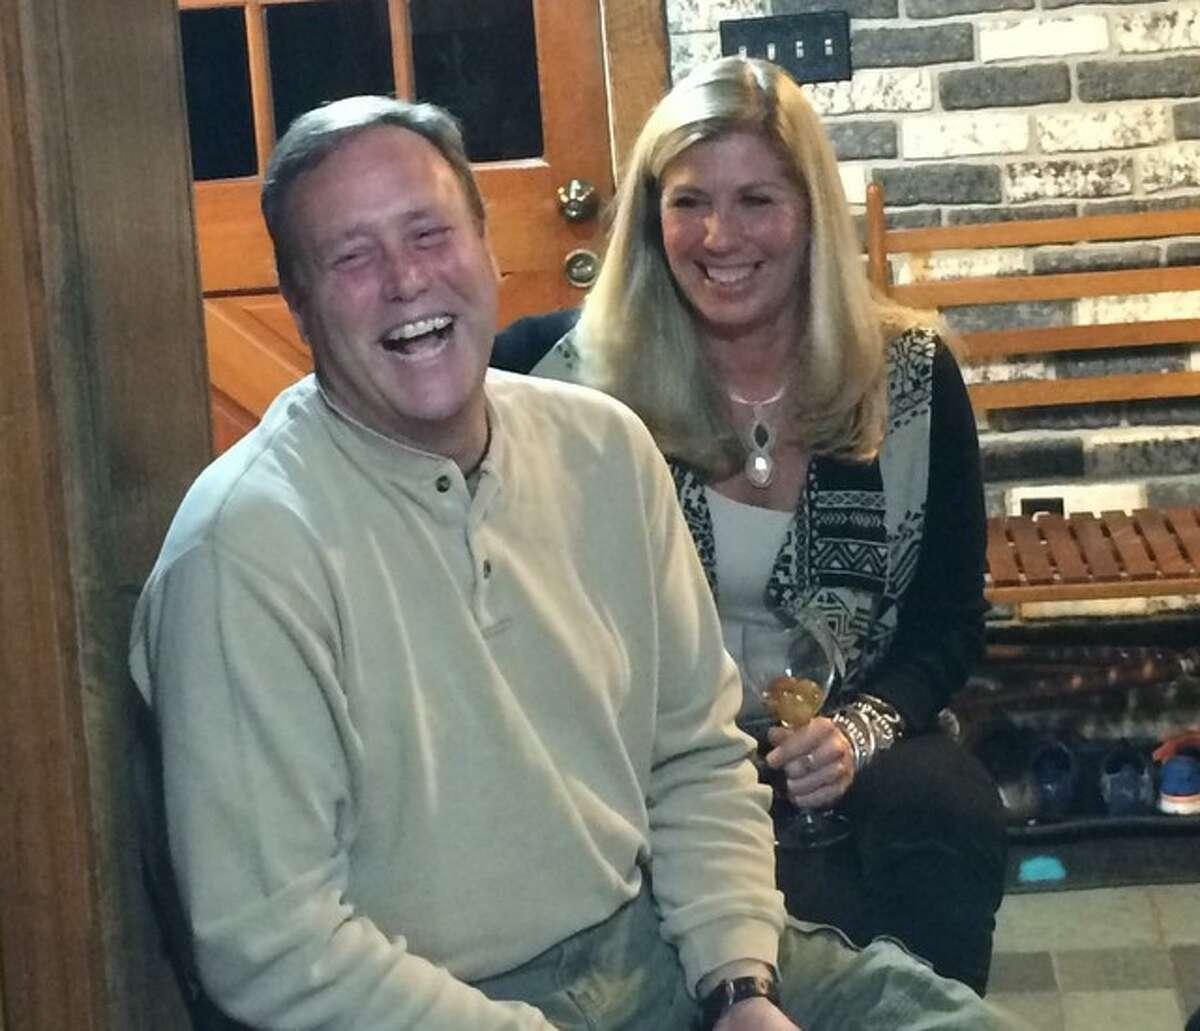 Eric Shilling and Lauren Cavanaugh (Courtesy Lauren Cavanaugh)